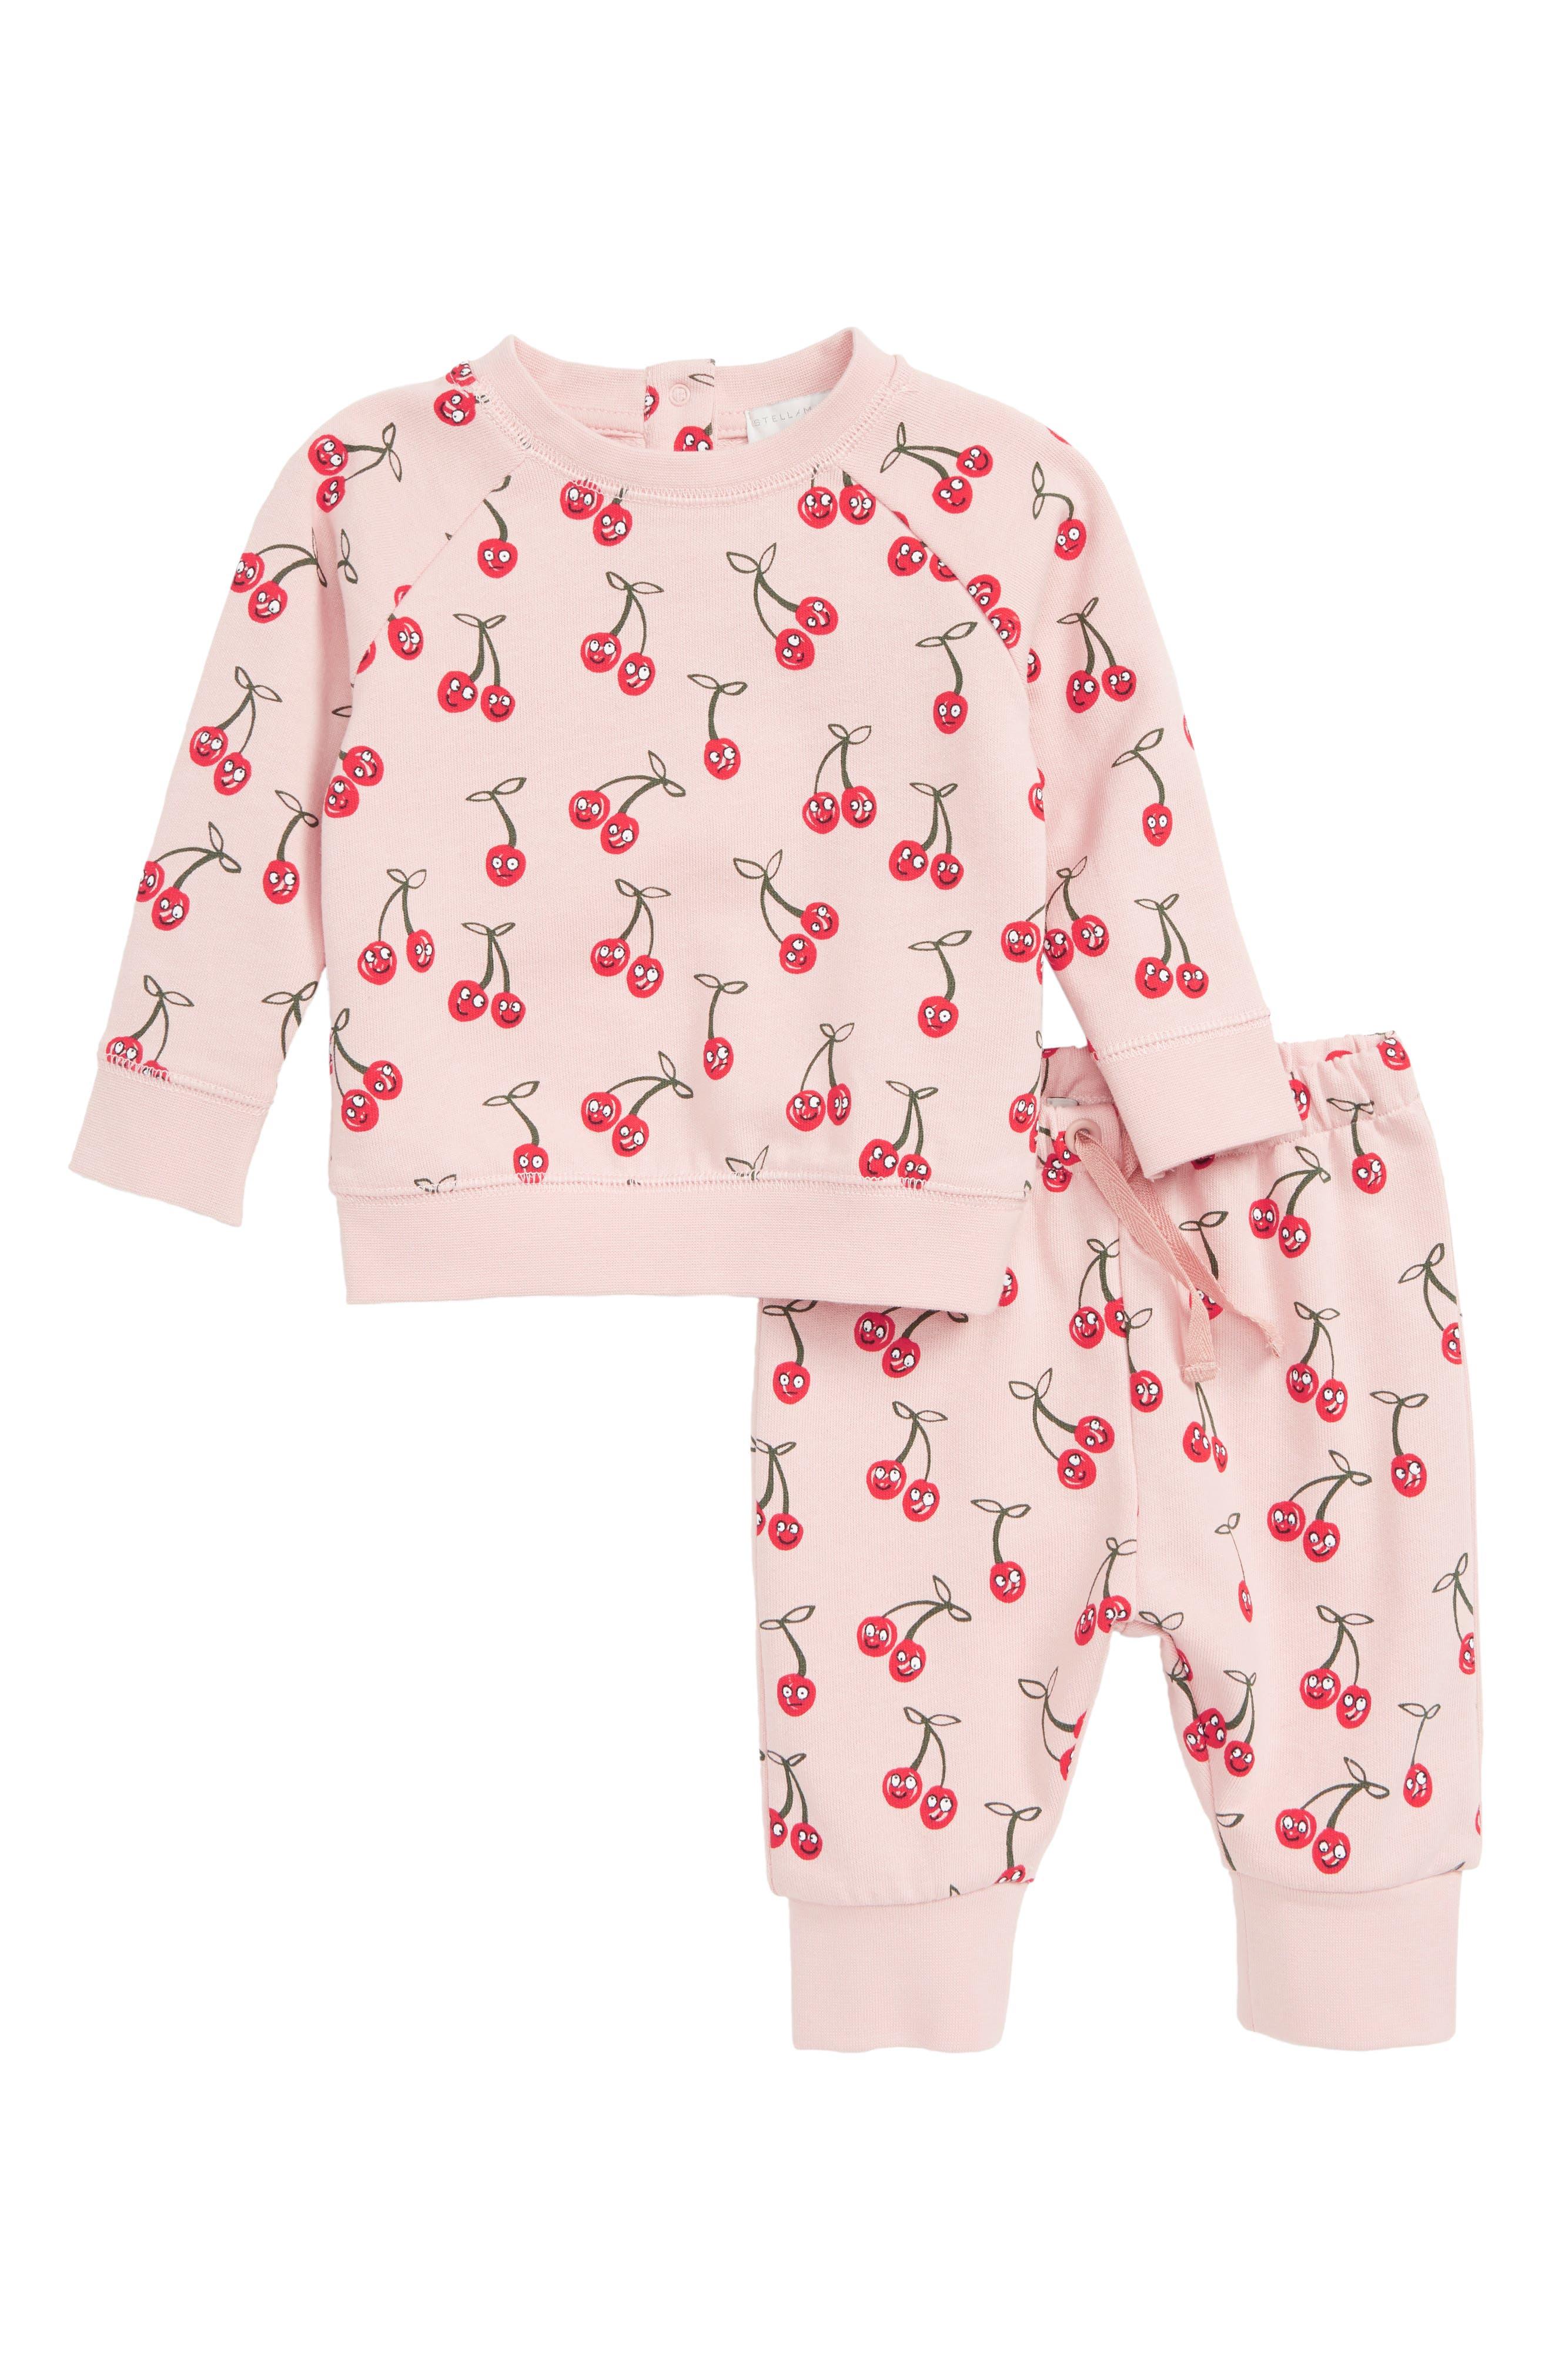 STELLA MCCARTNEY KIDS, Cherries Sweatshirt & Sweatpants Set, Main thumbnail 1, color, 5771 PINK